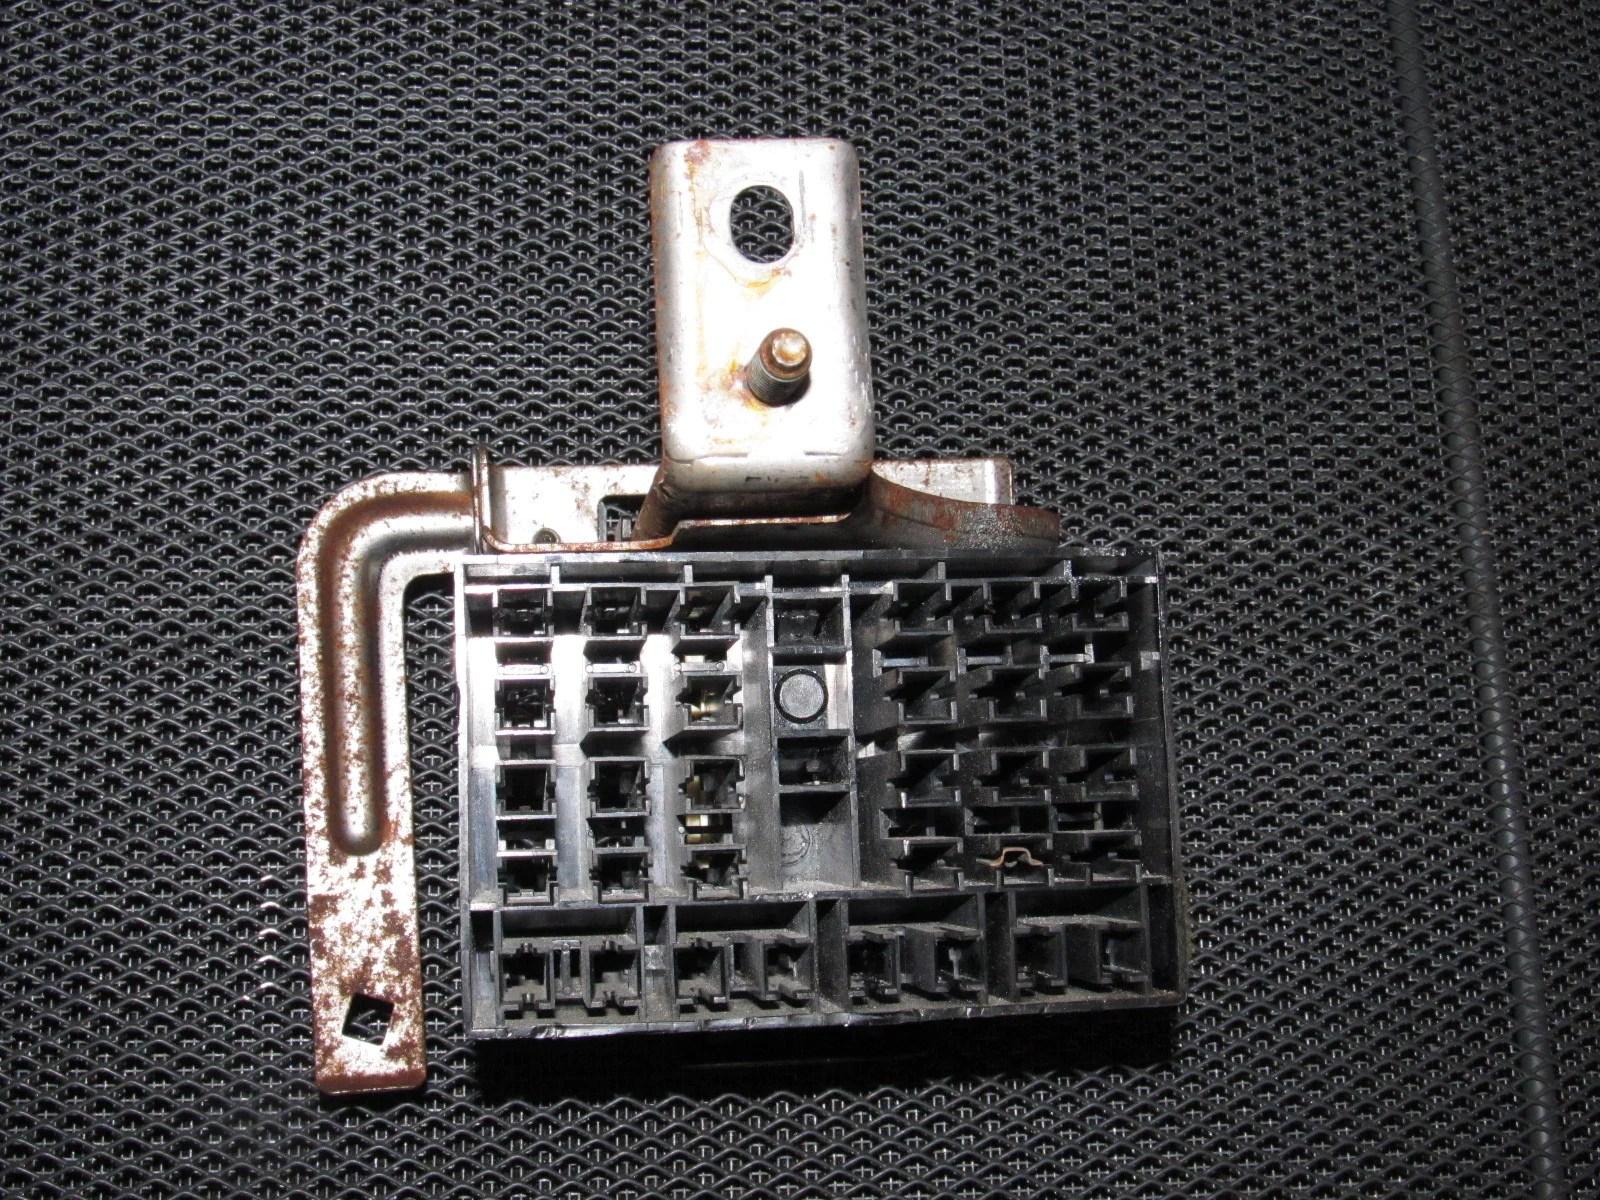 96 Miata Fuse Box Auto Electrical Wiring Diagram On Mazda Mx5 94 95 97 Oem Interior